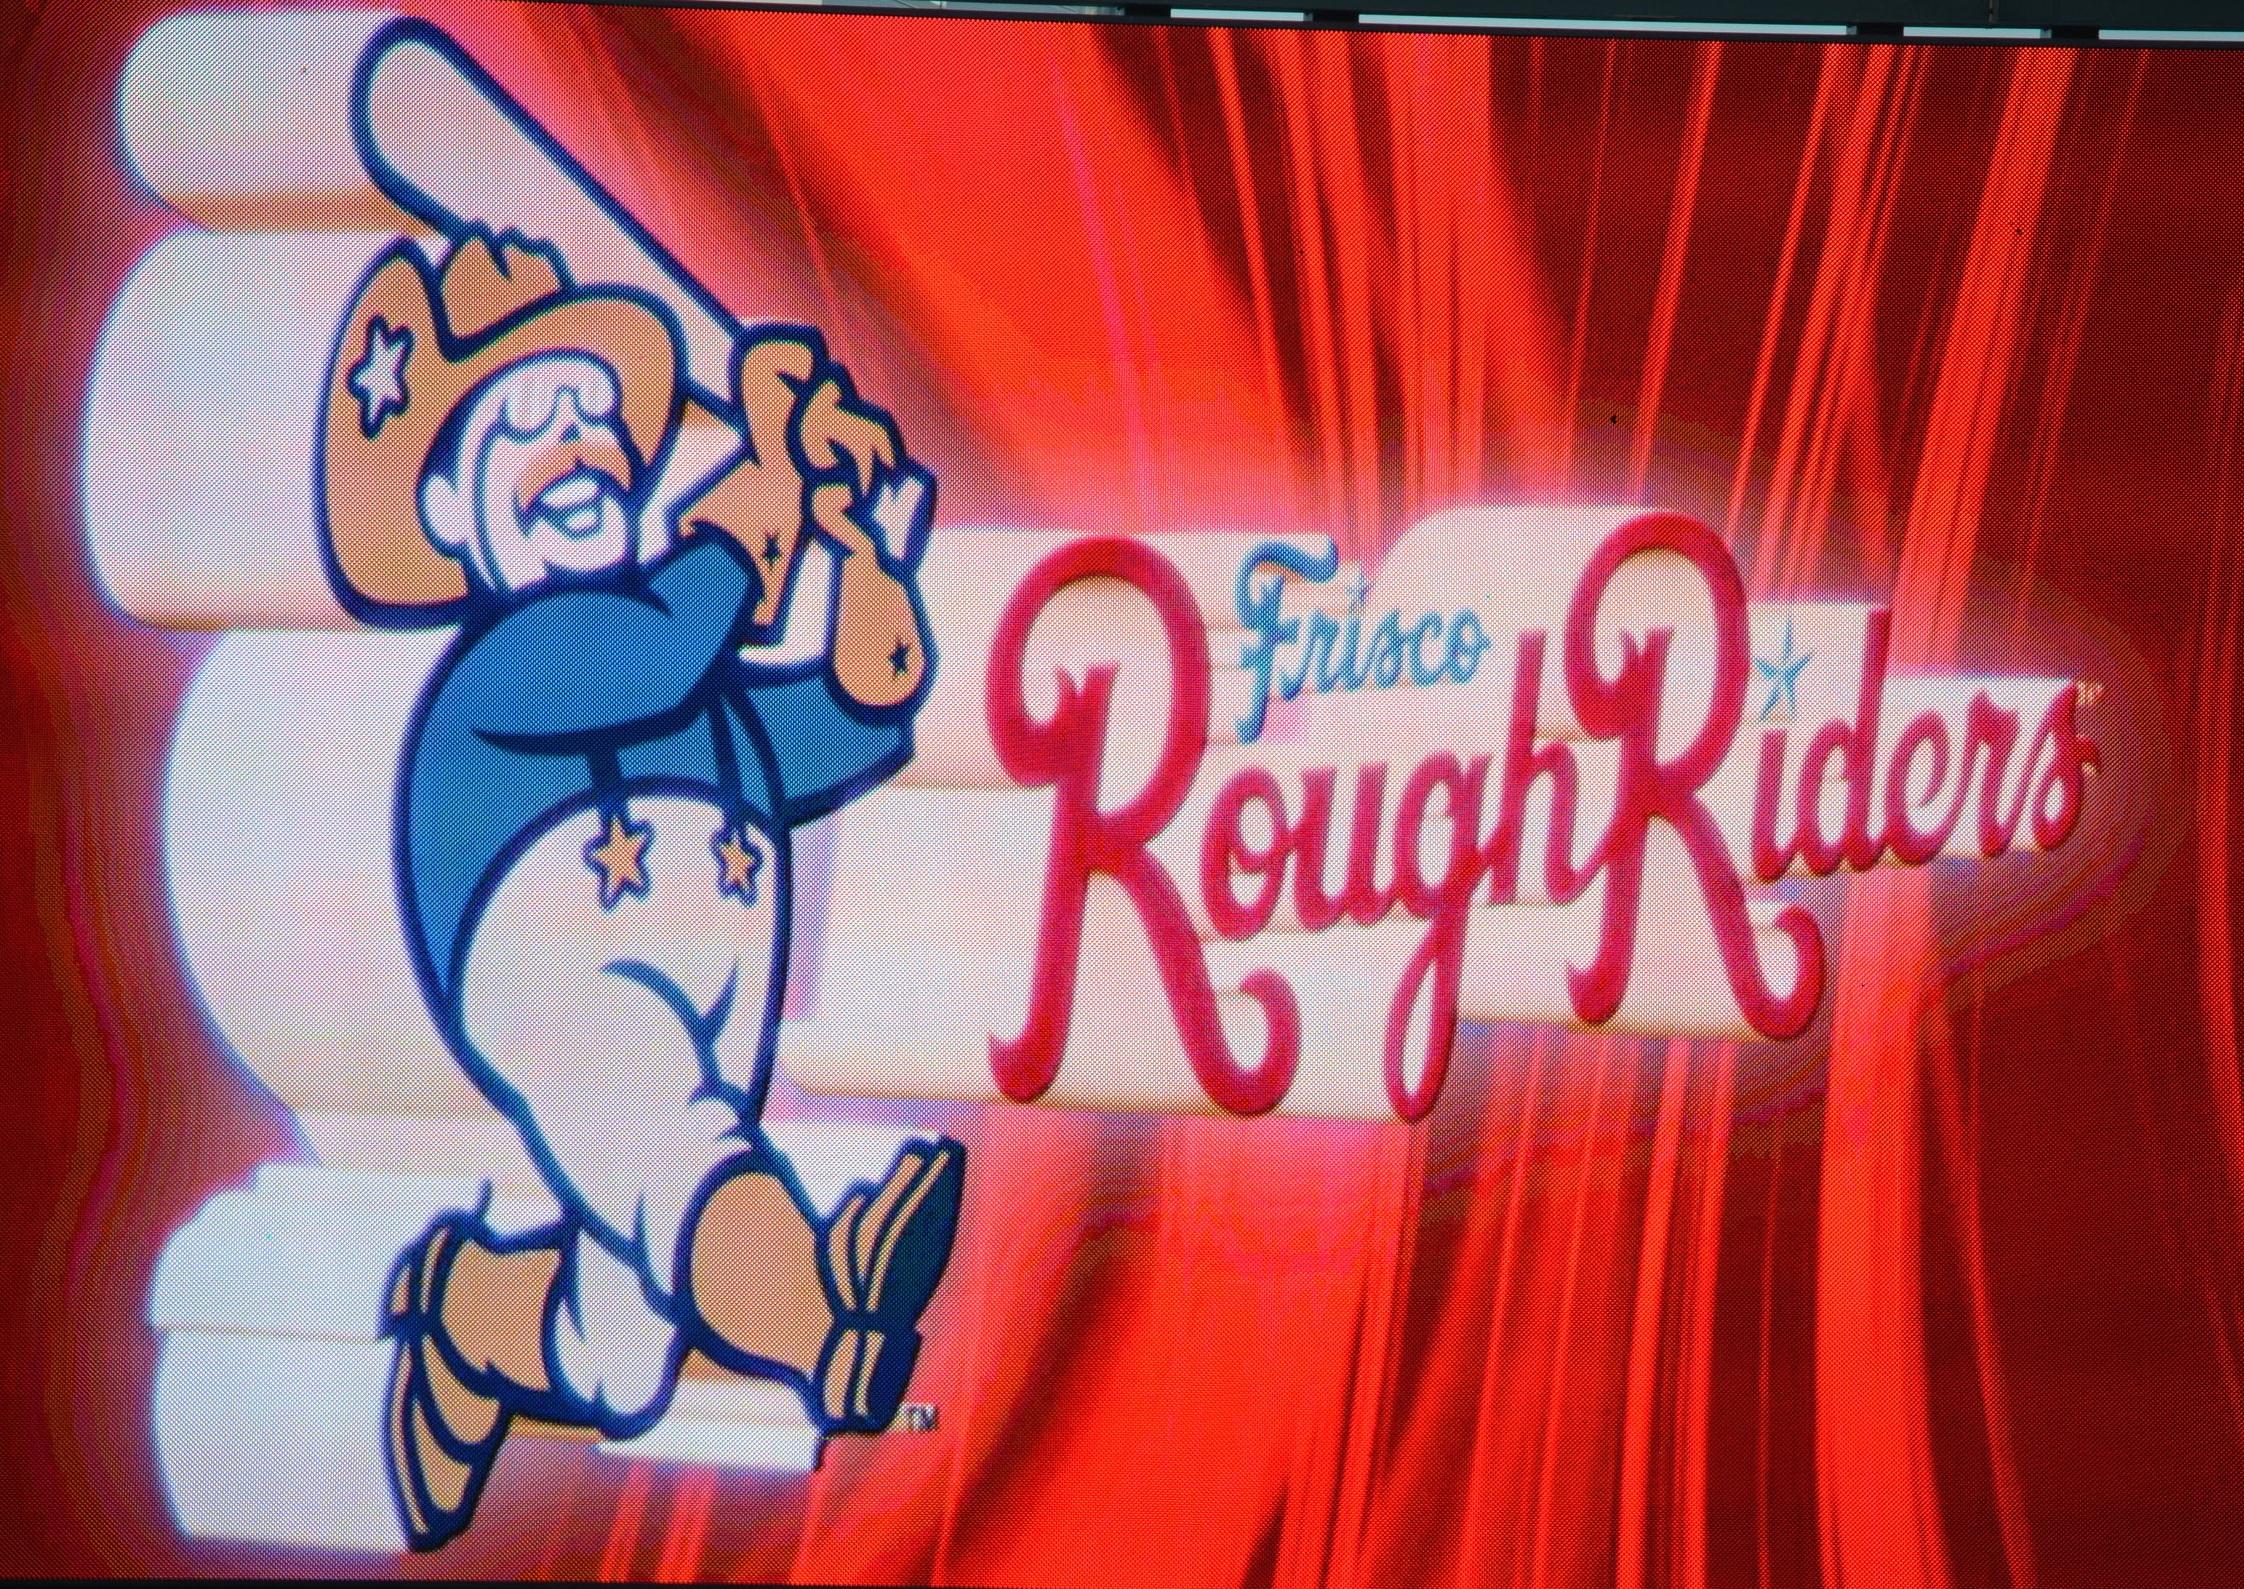 Frisco Roughriders games are fun!